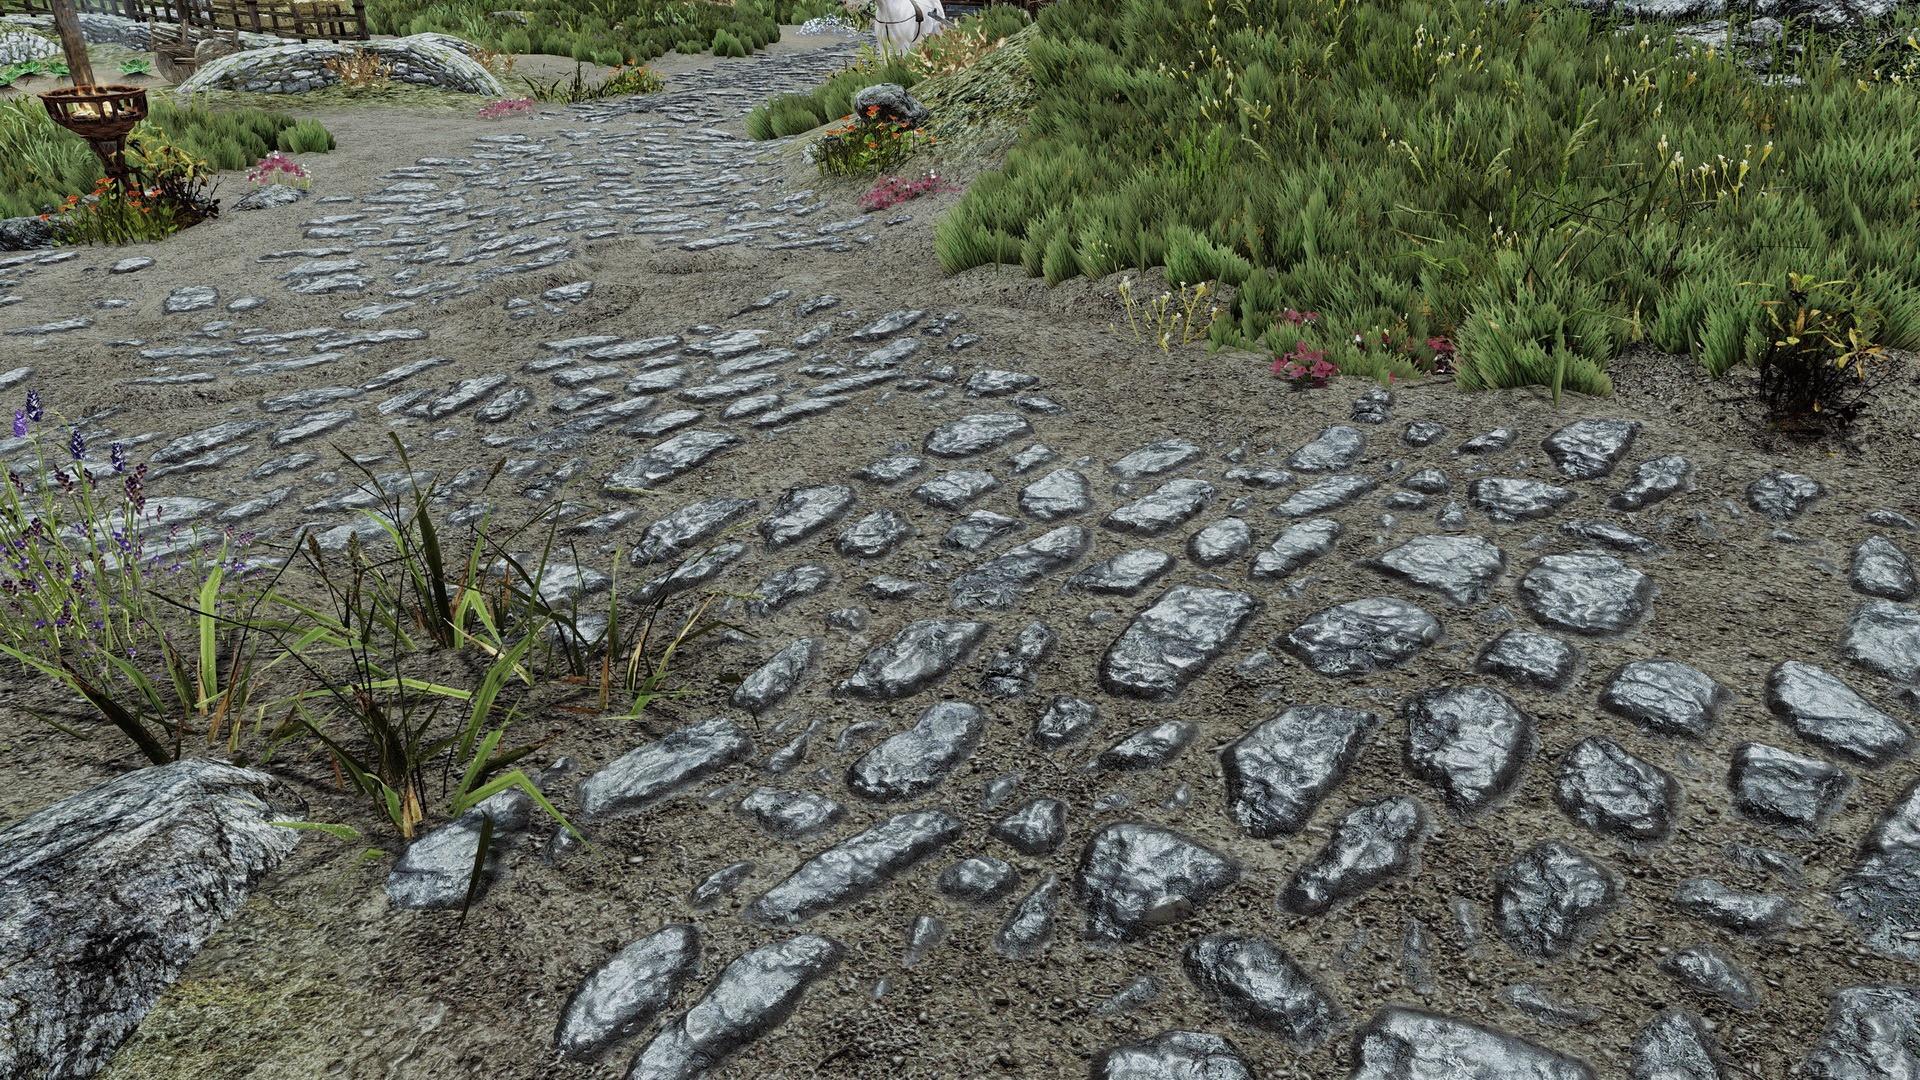 Best ideas about Skyrim Landscape Overhaul . Save or Pin Модификация Landscape Overhaul HD с 2K текстурами Now.